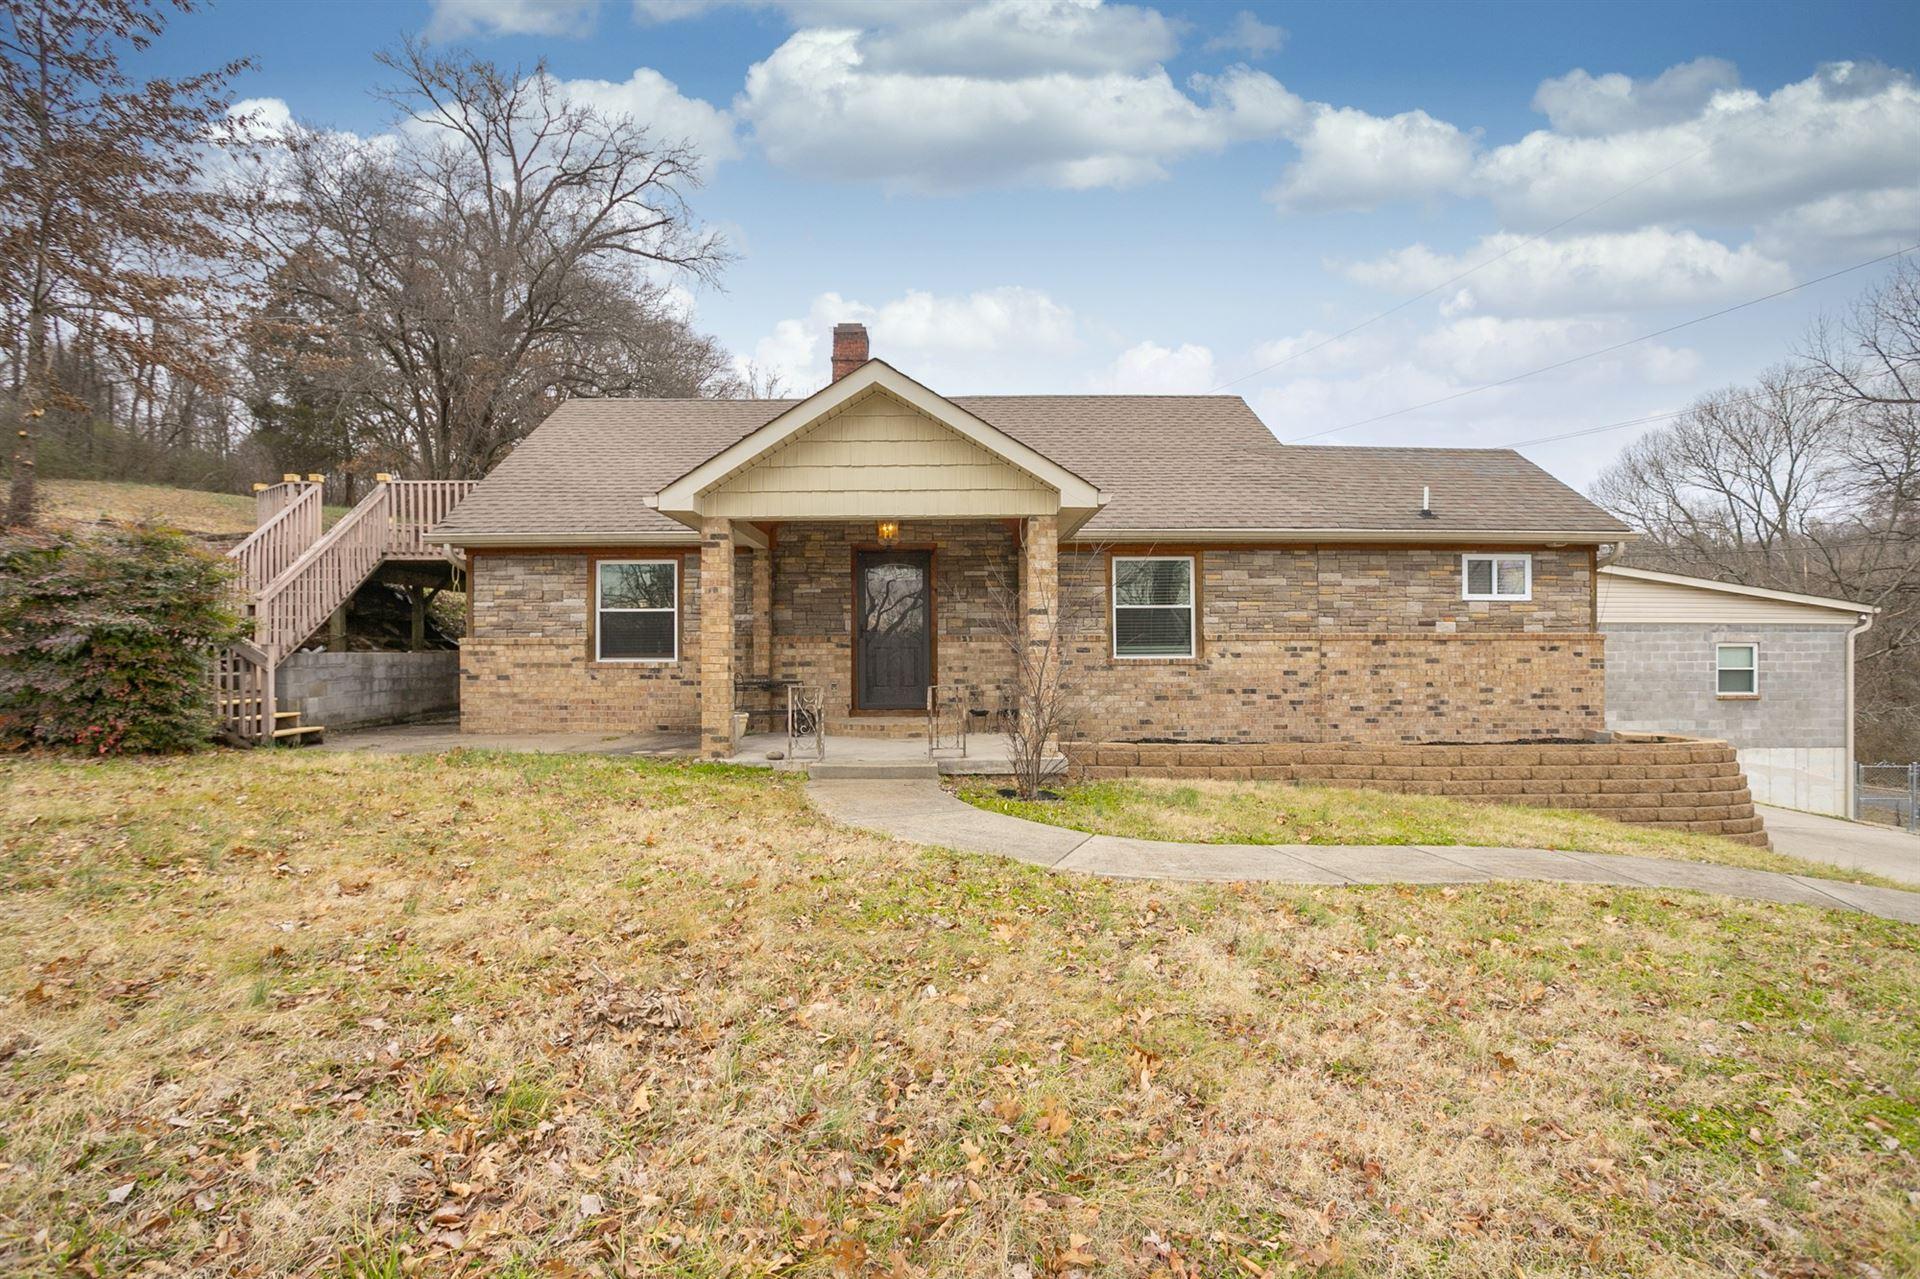 Photo of 4850 Payne Rd, Antioch, TN 37013 (MLS # 2233813)